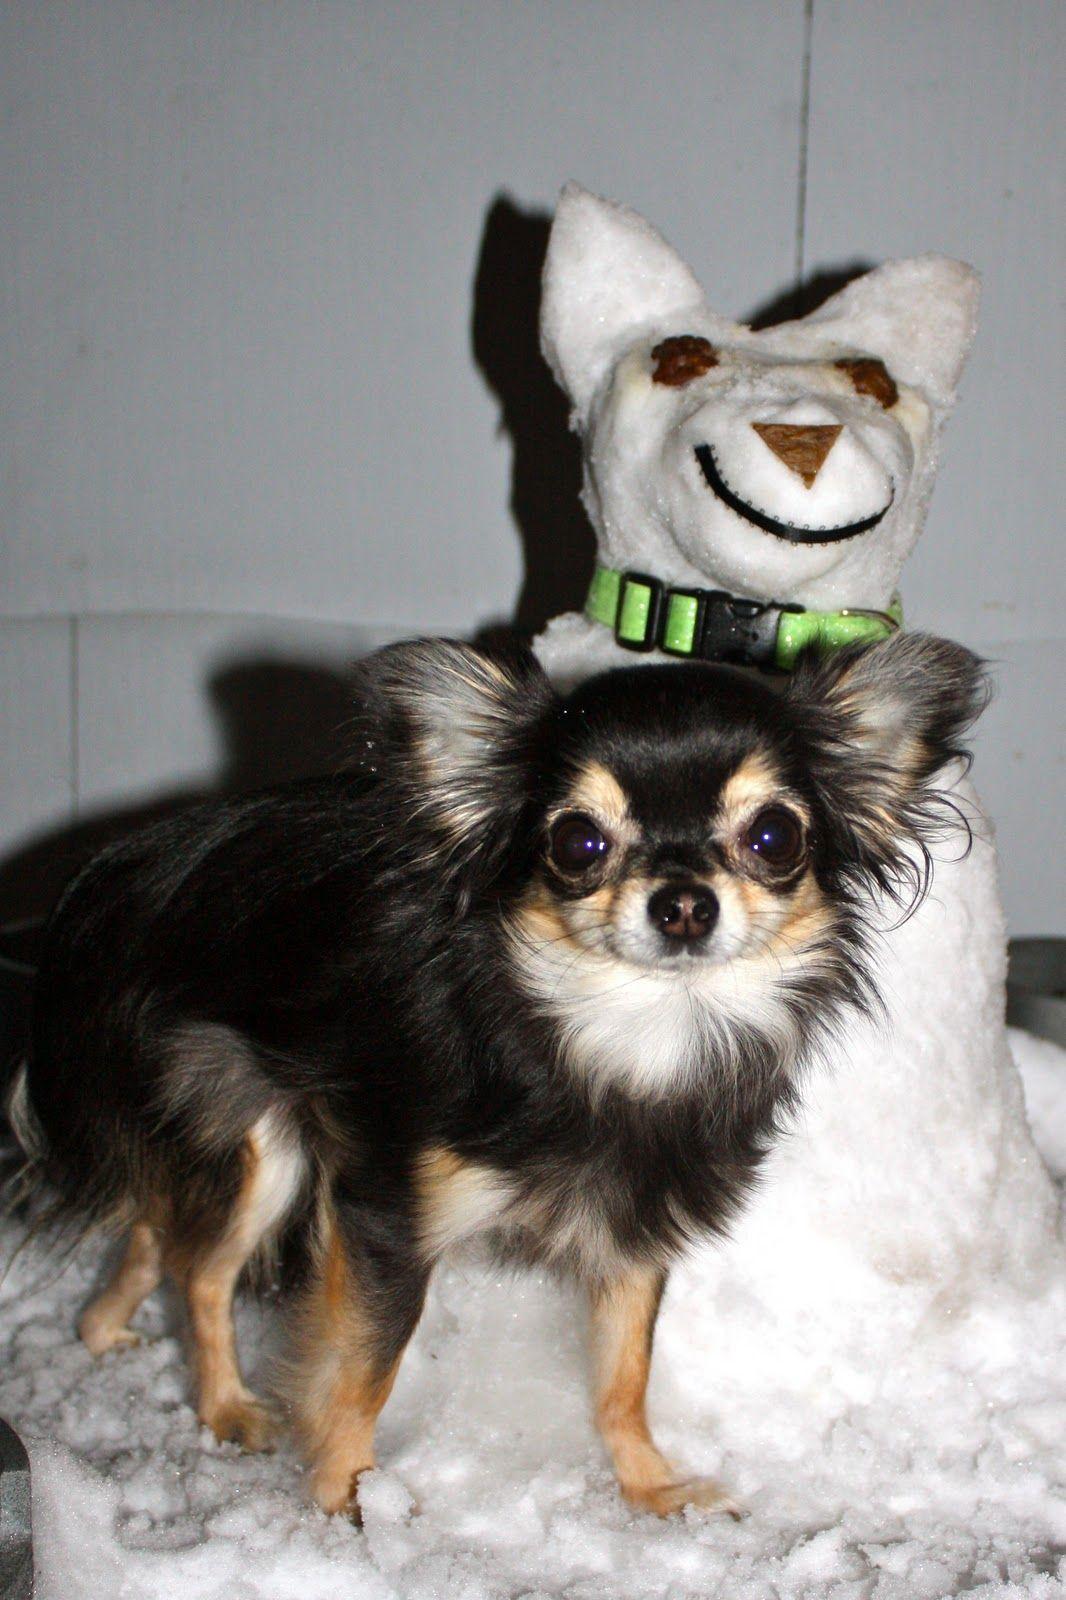 Me And My Snow Chihuahua Chihuahua Love Chihuahua